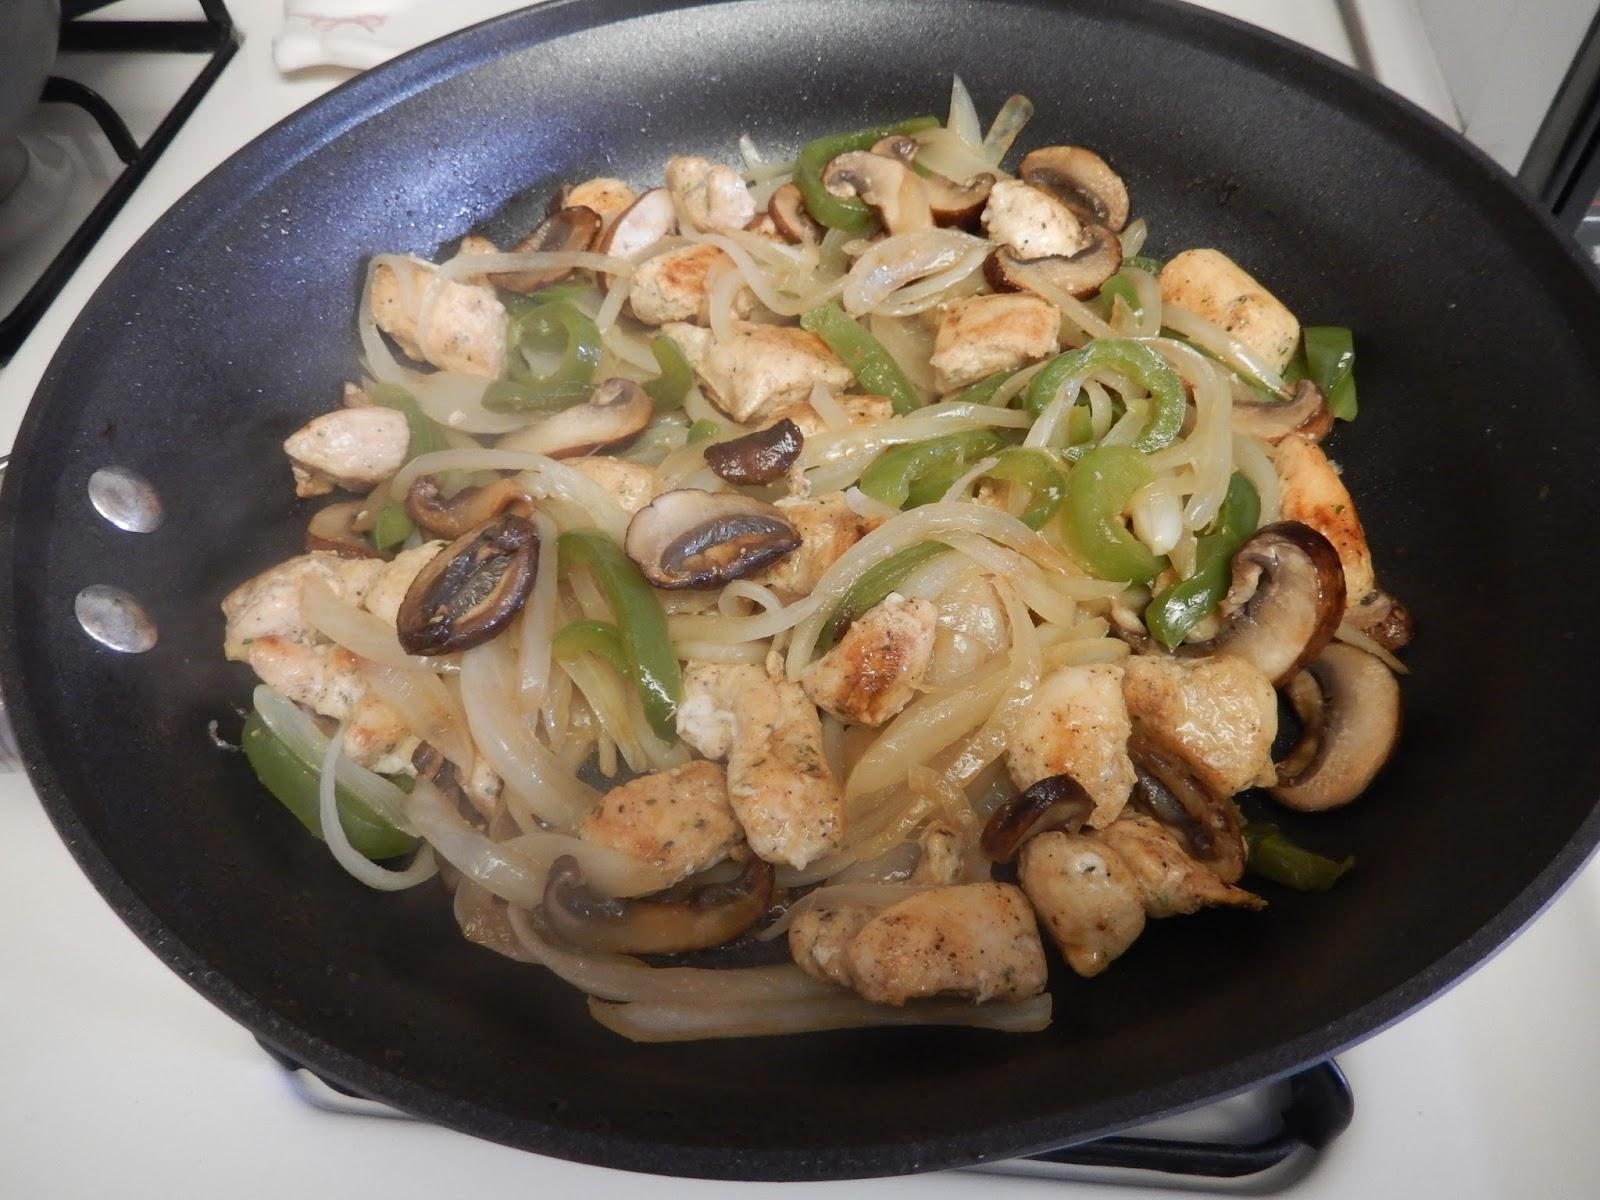 Weight loss vegan dinner